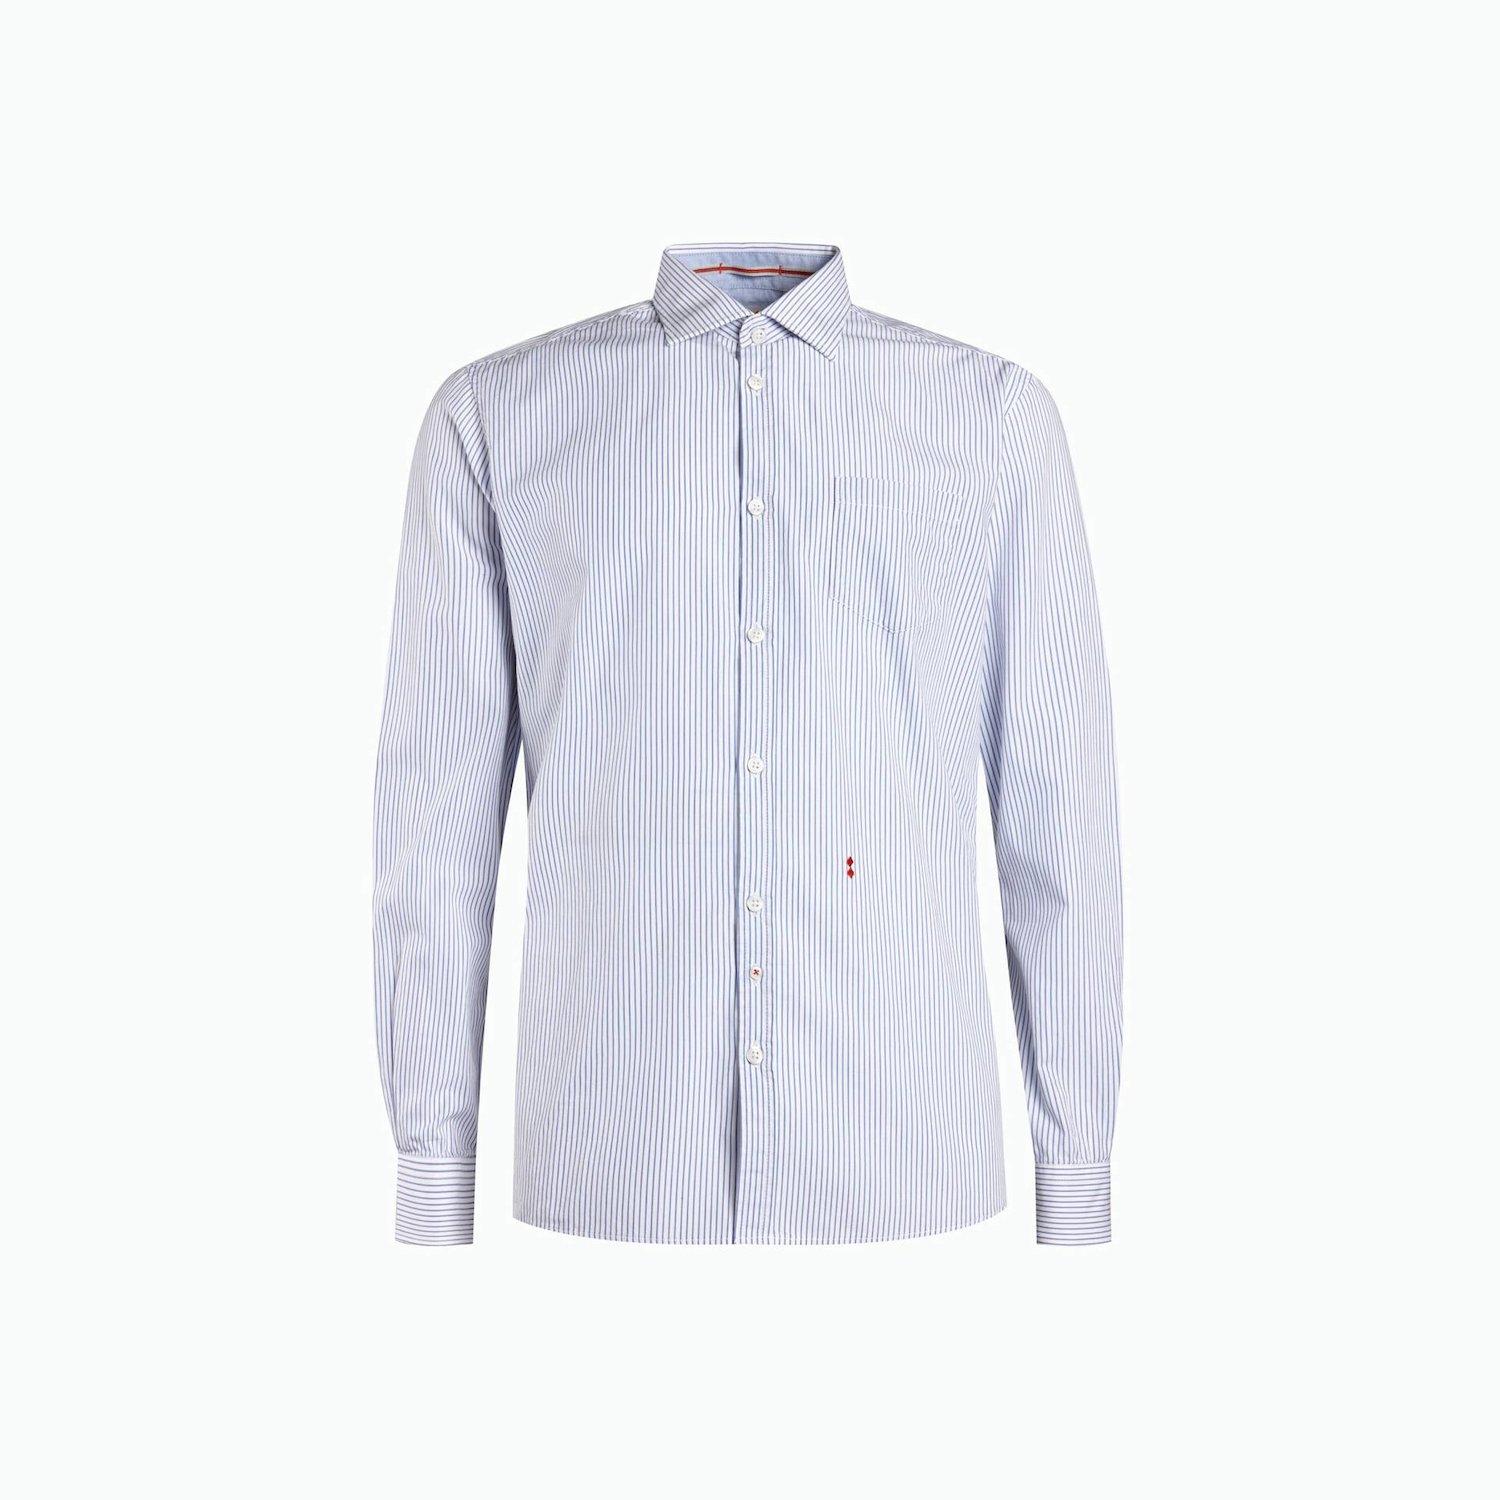 B13 shirt - White / Light Blue